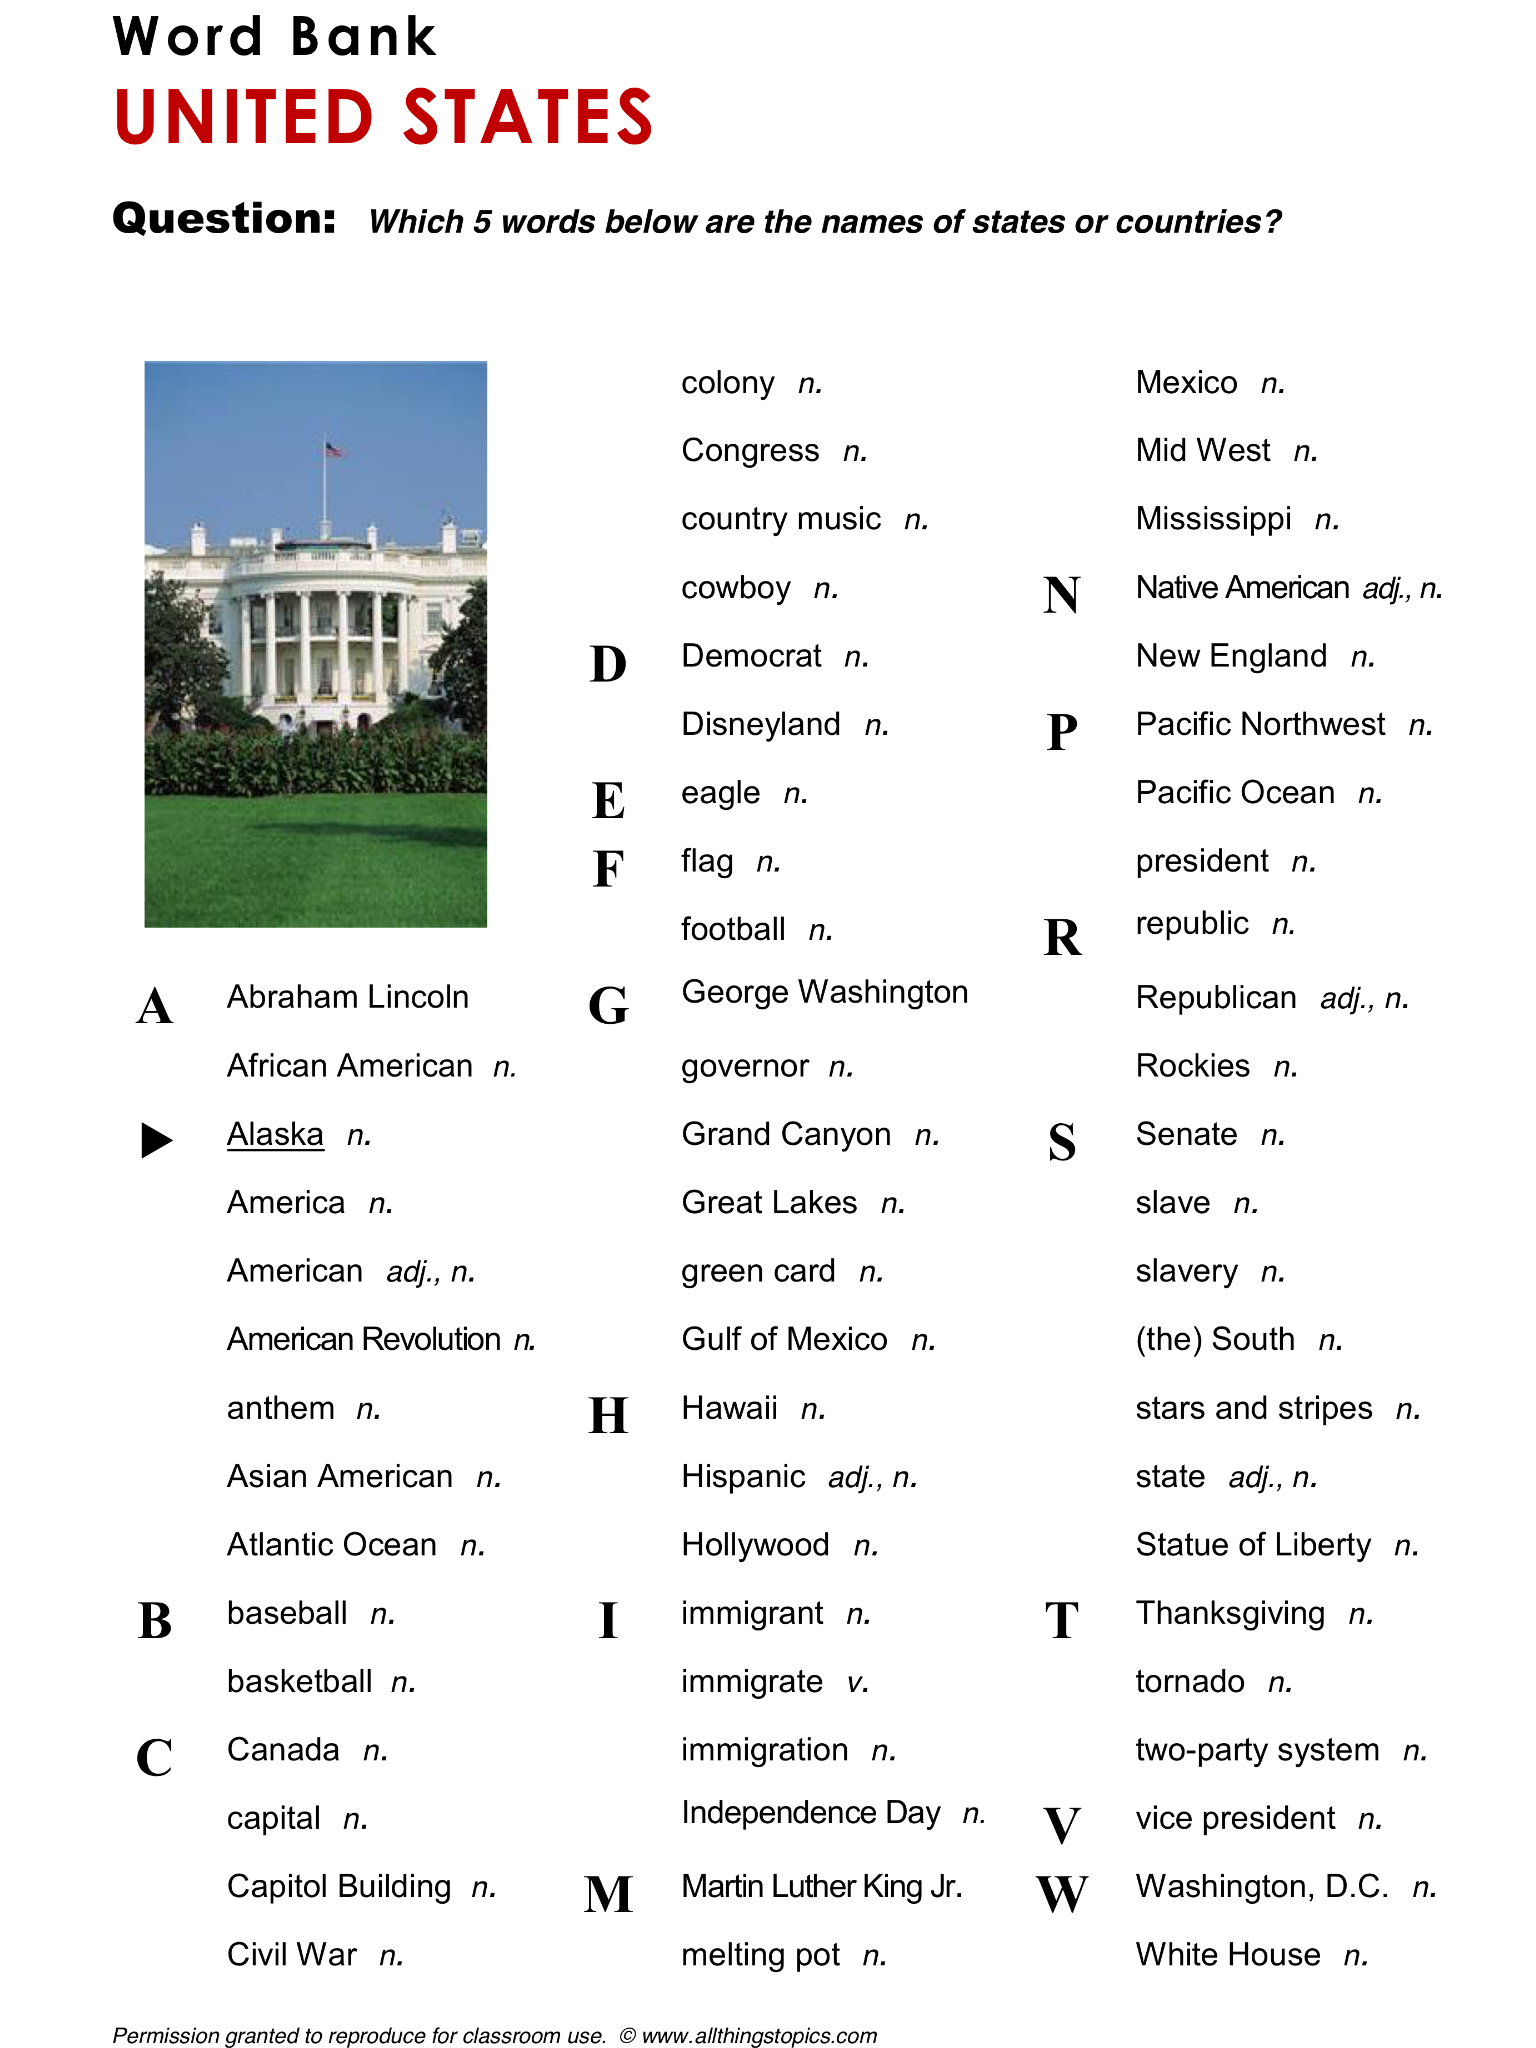 United States, English, Learning English, Vocabulary, ESL, English Phrases, http://www.allthingstopics.com/united-states.html